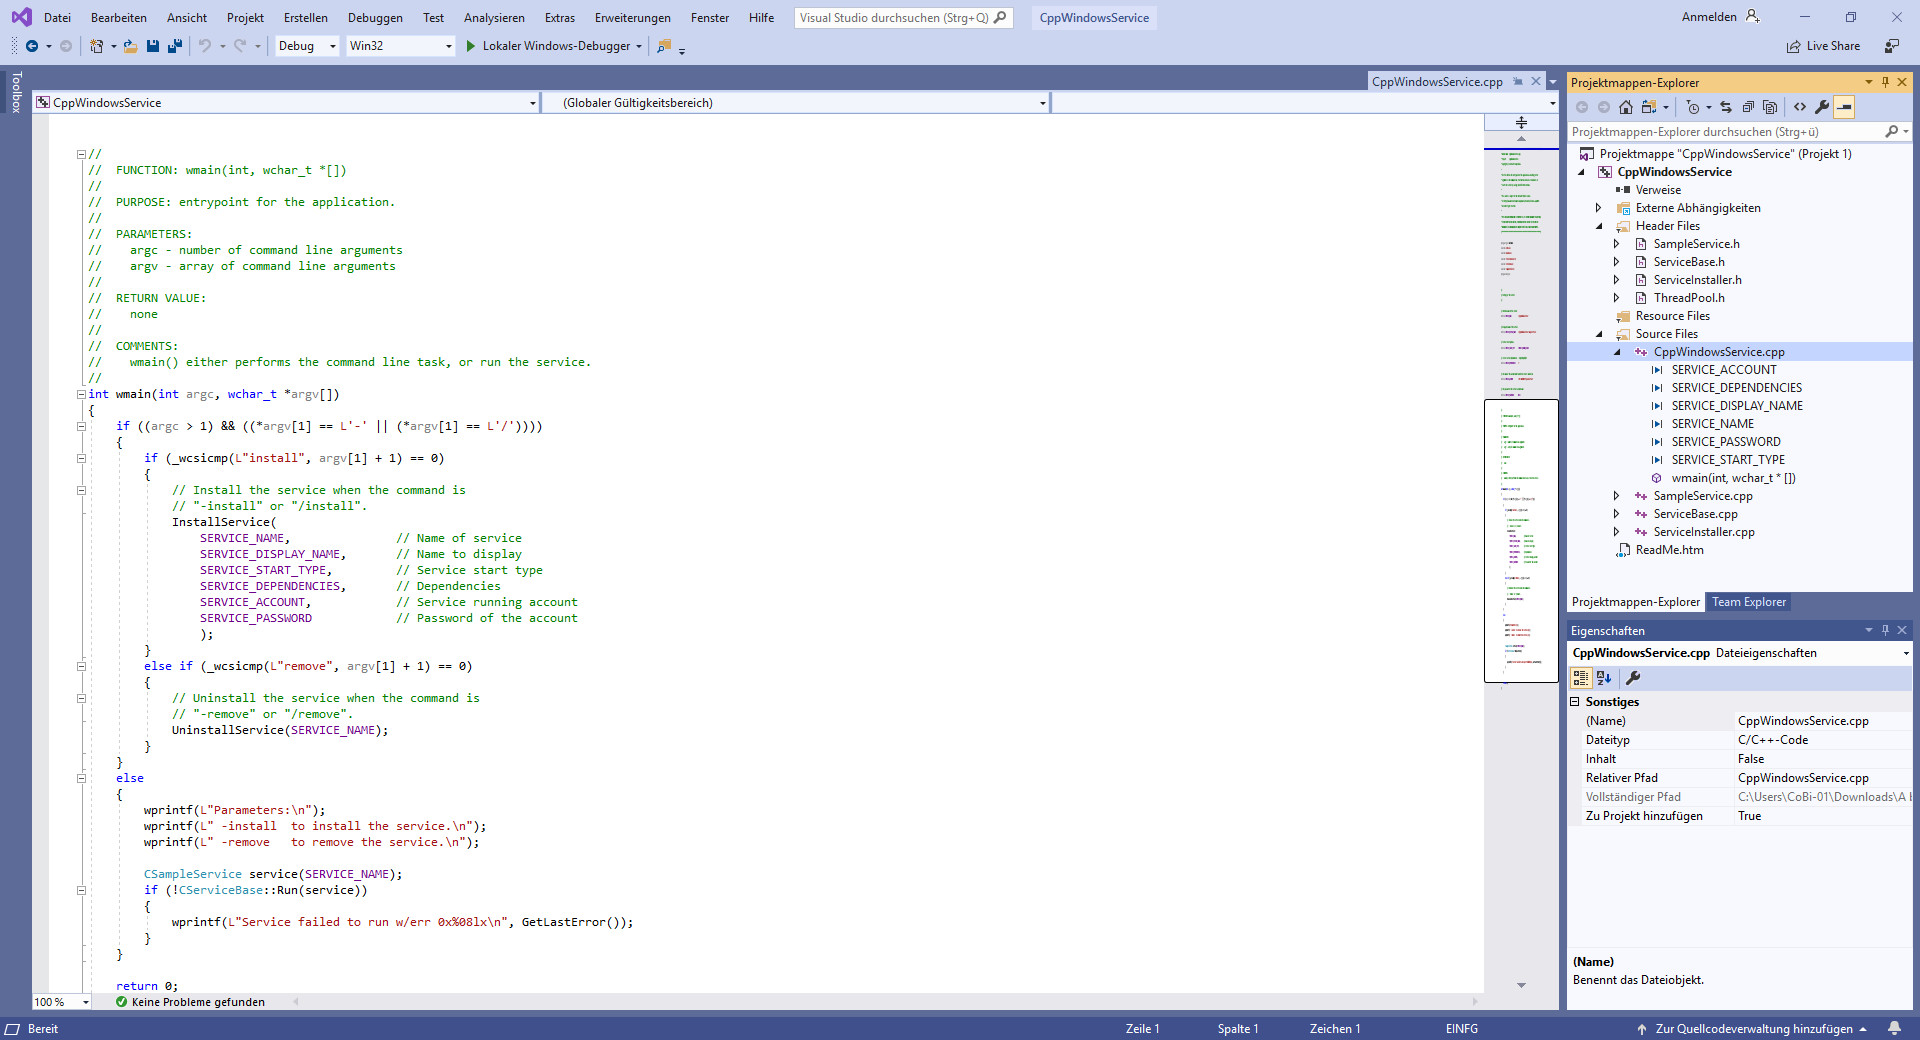 Screenshot 1 - Visual Studio Professional 2019